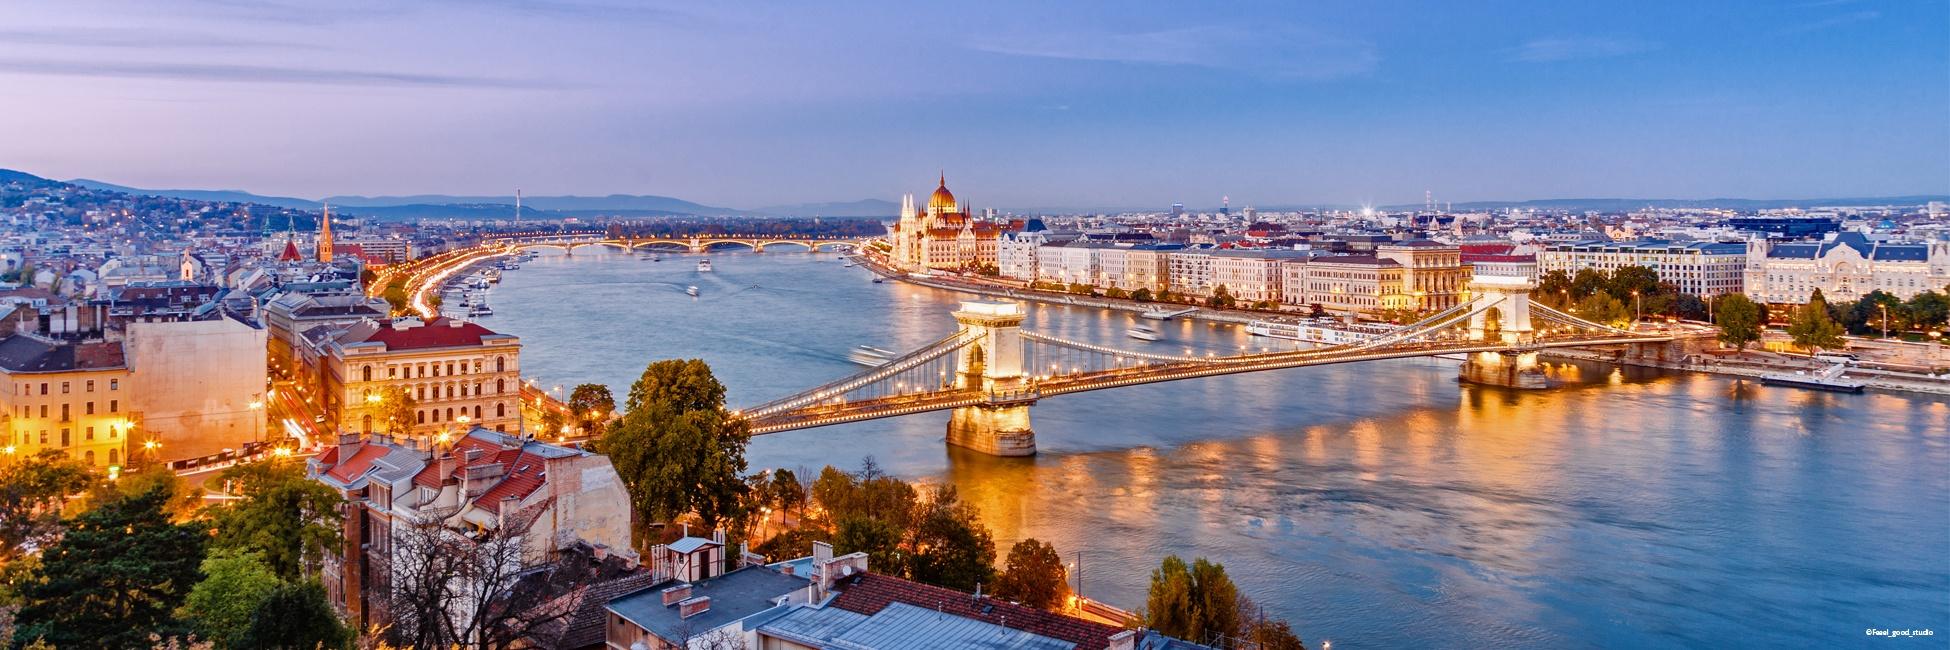 Karta Over Budapest Sevardheter.Flodkryssning Donau Tre Huvudstader Langs Donau Escape Travel